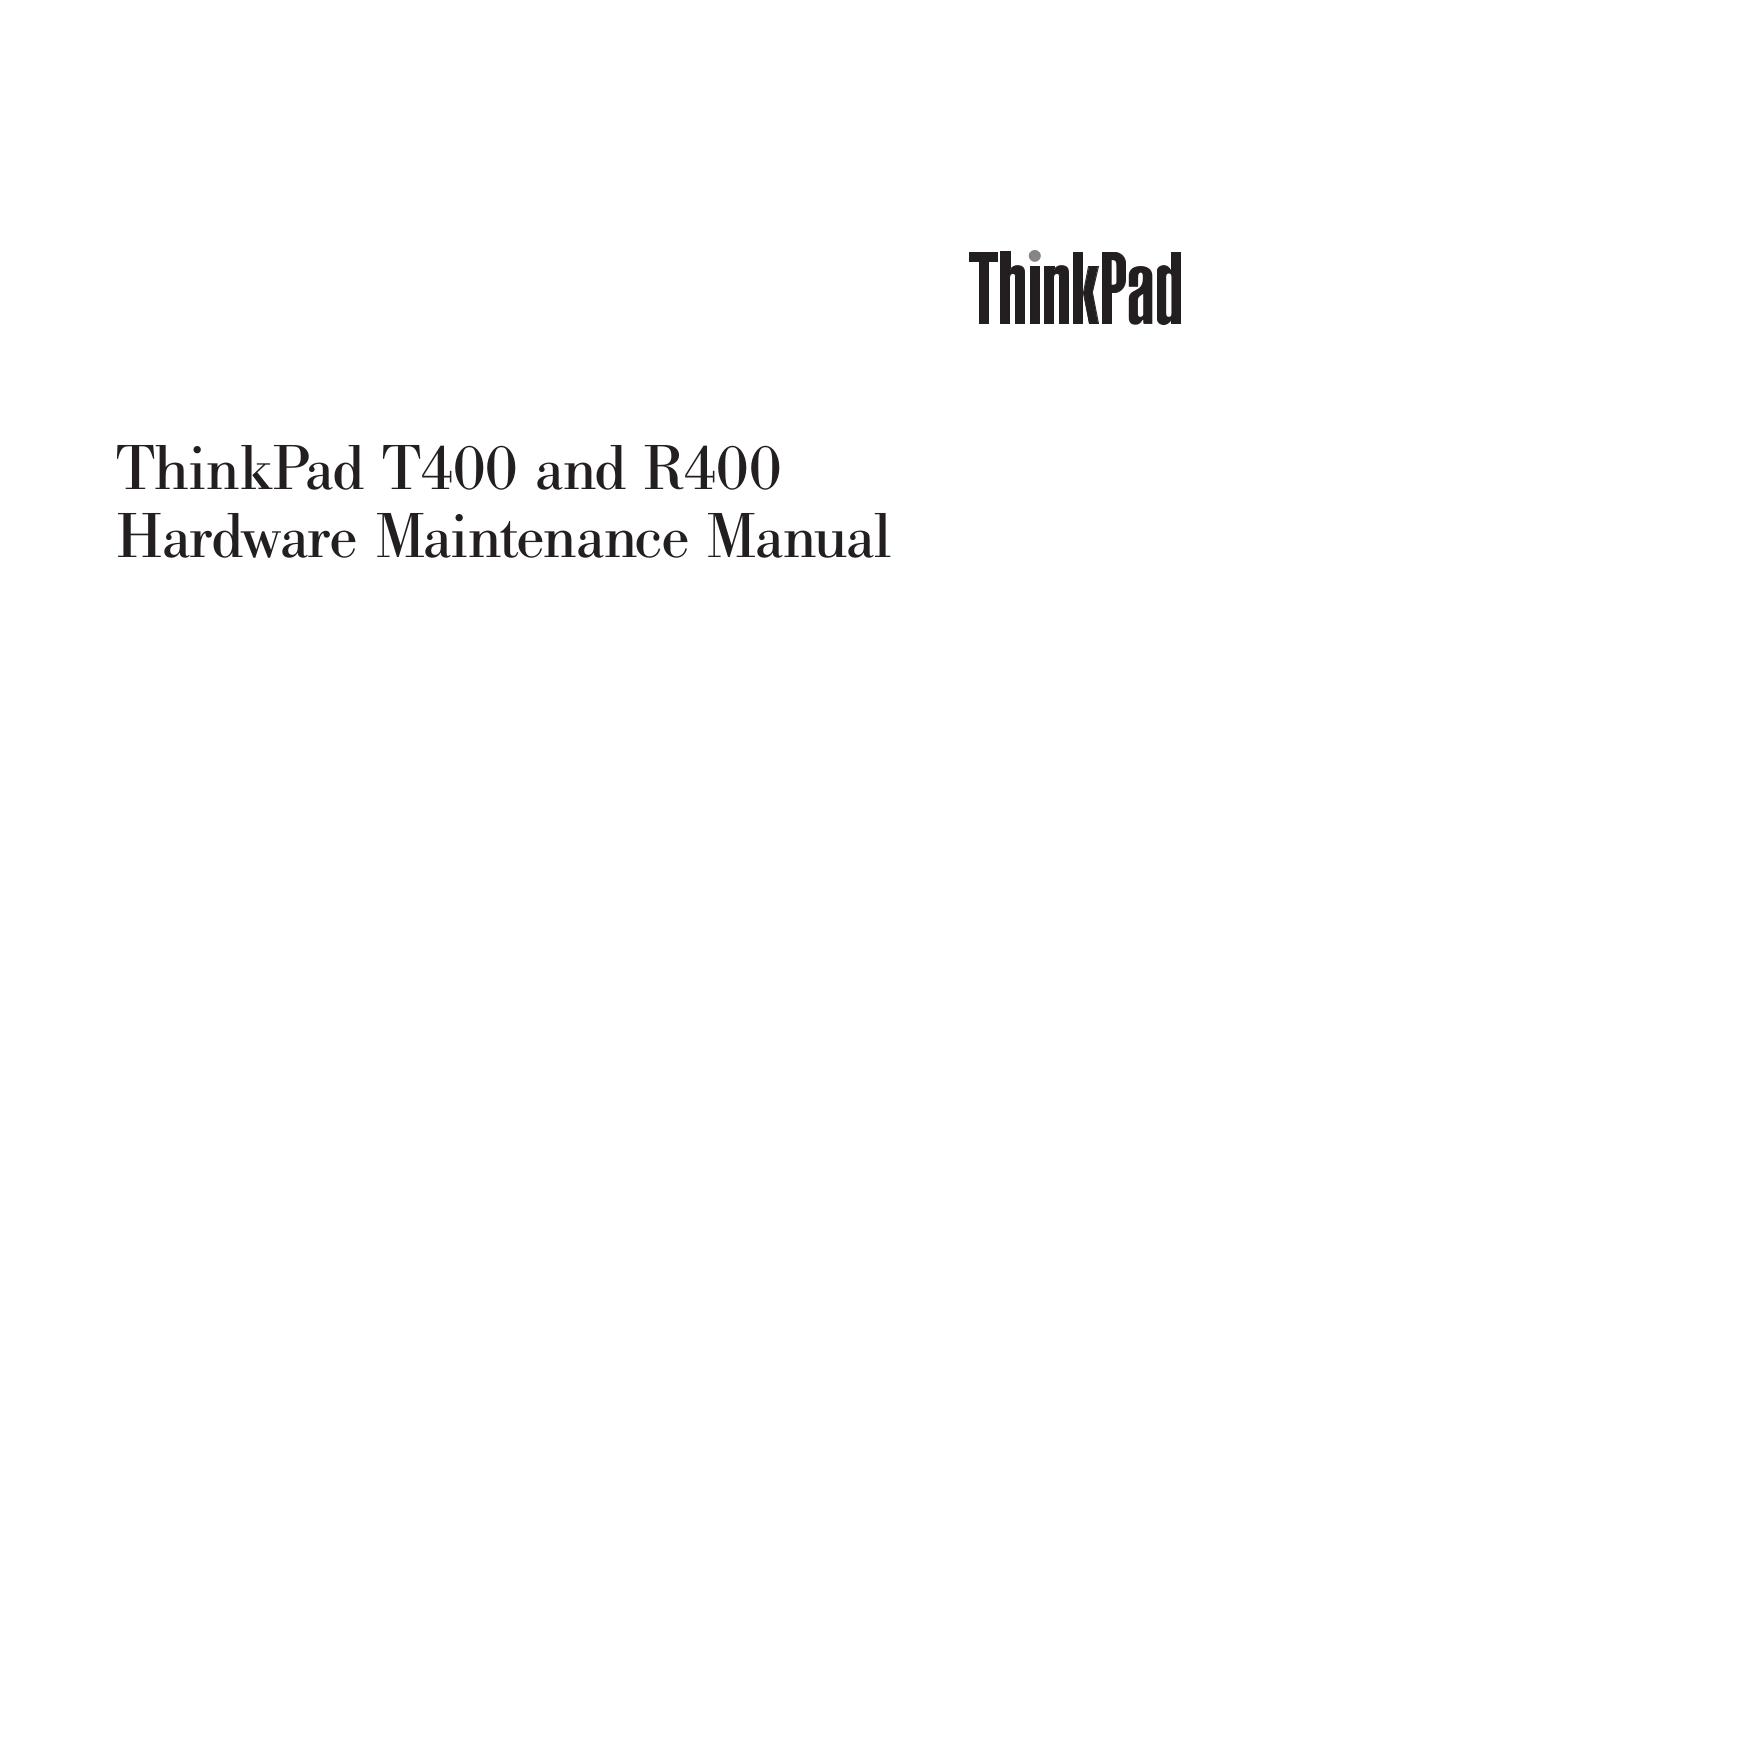 download free pdf for lenovo thinkpad r400 7439 laptop manual